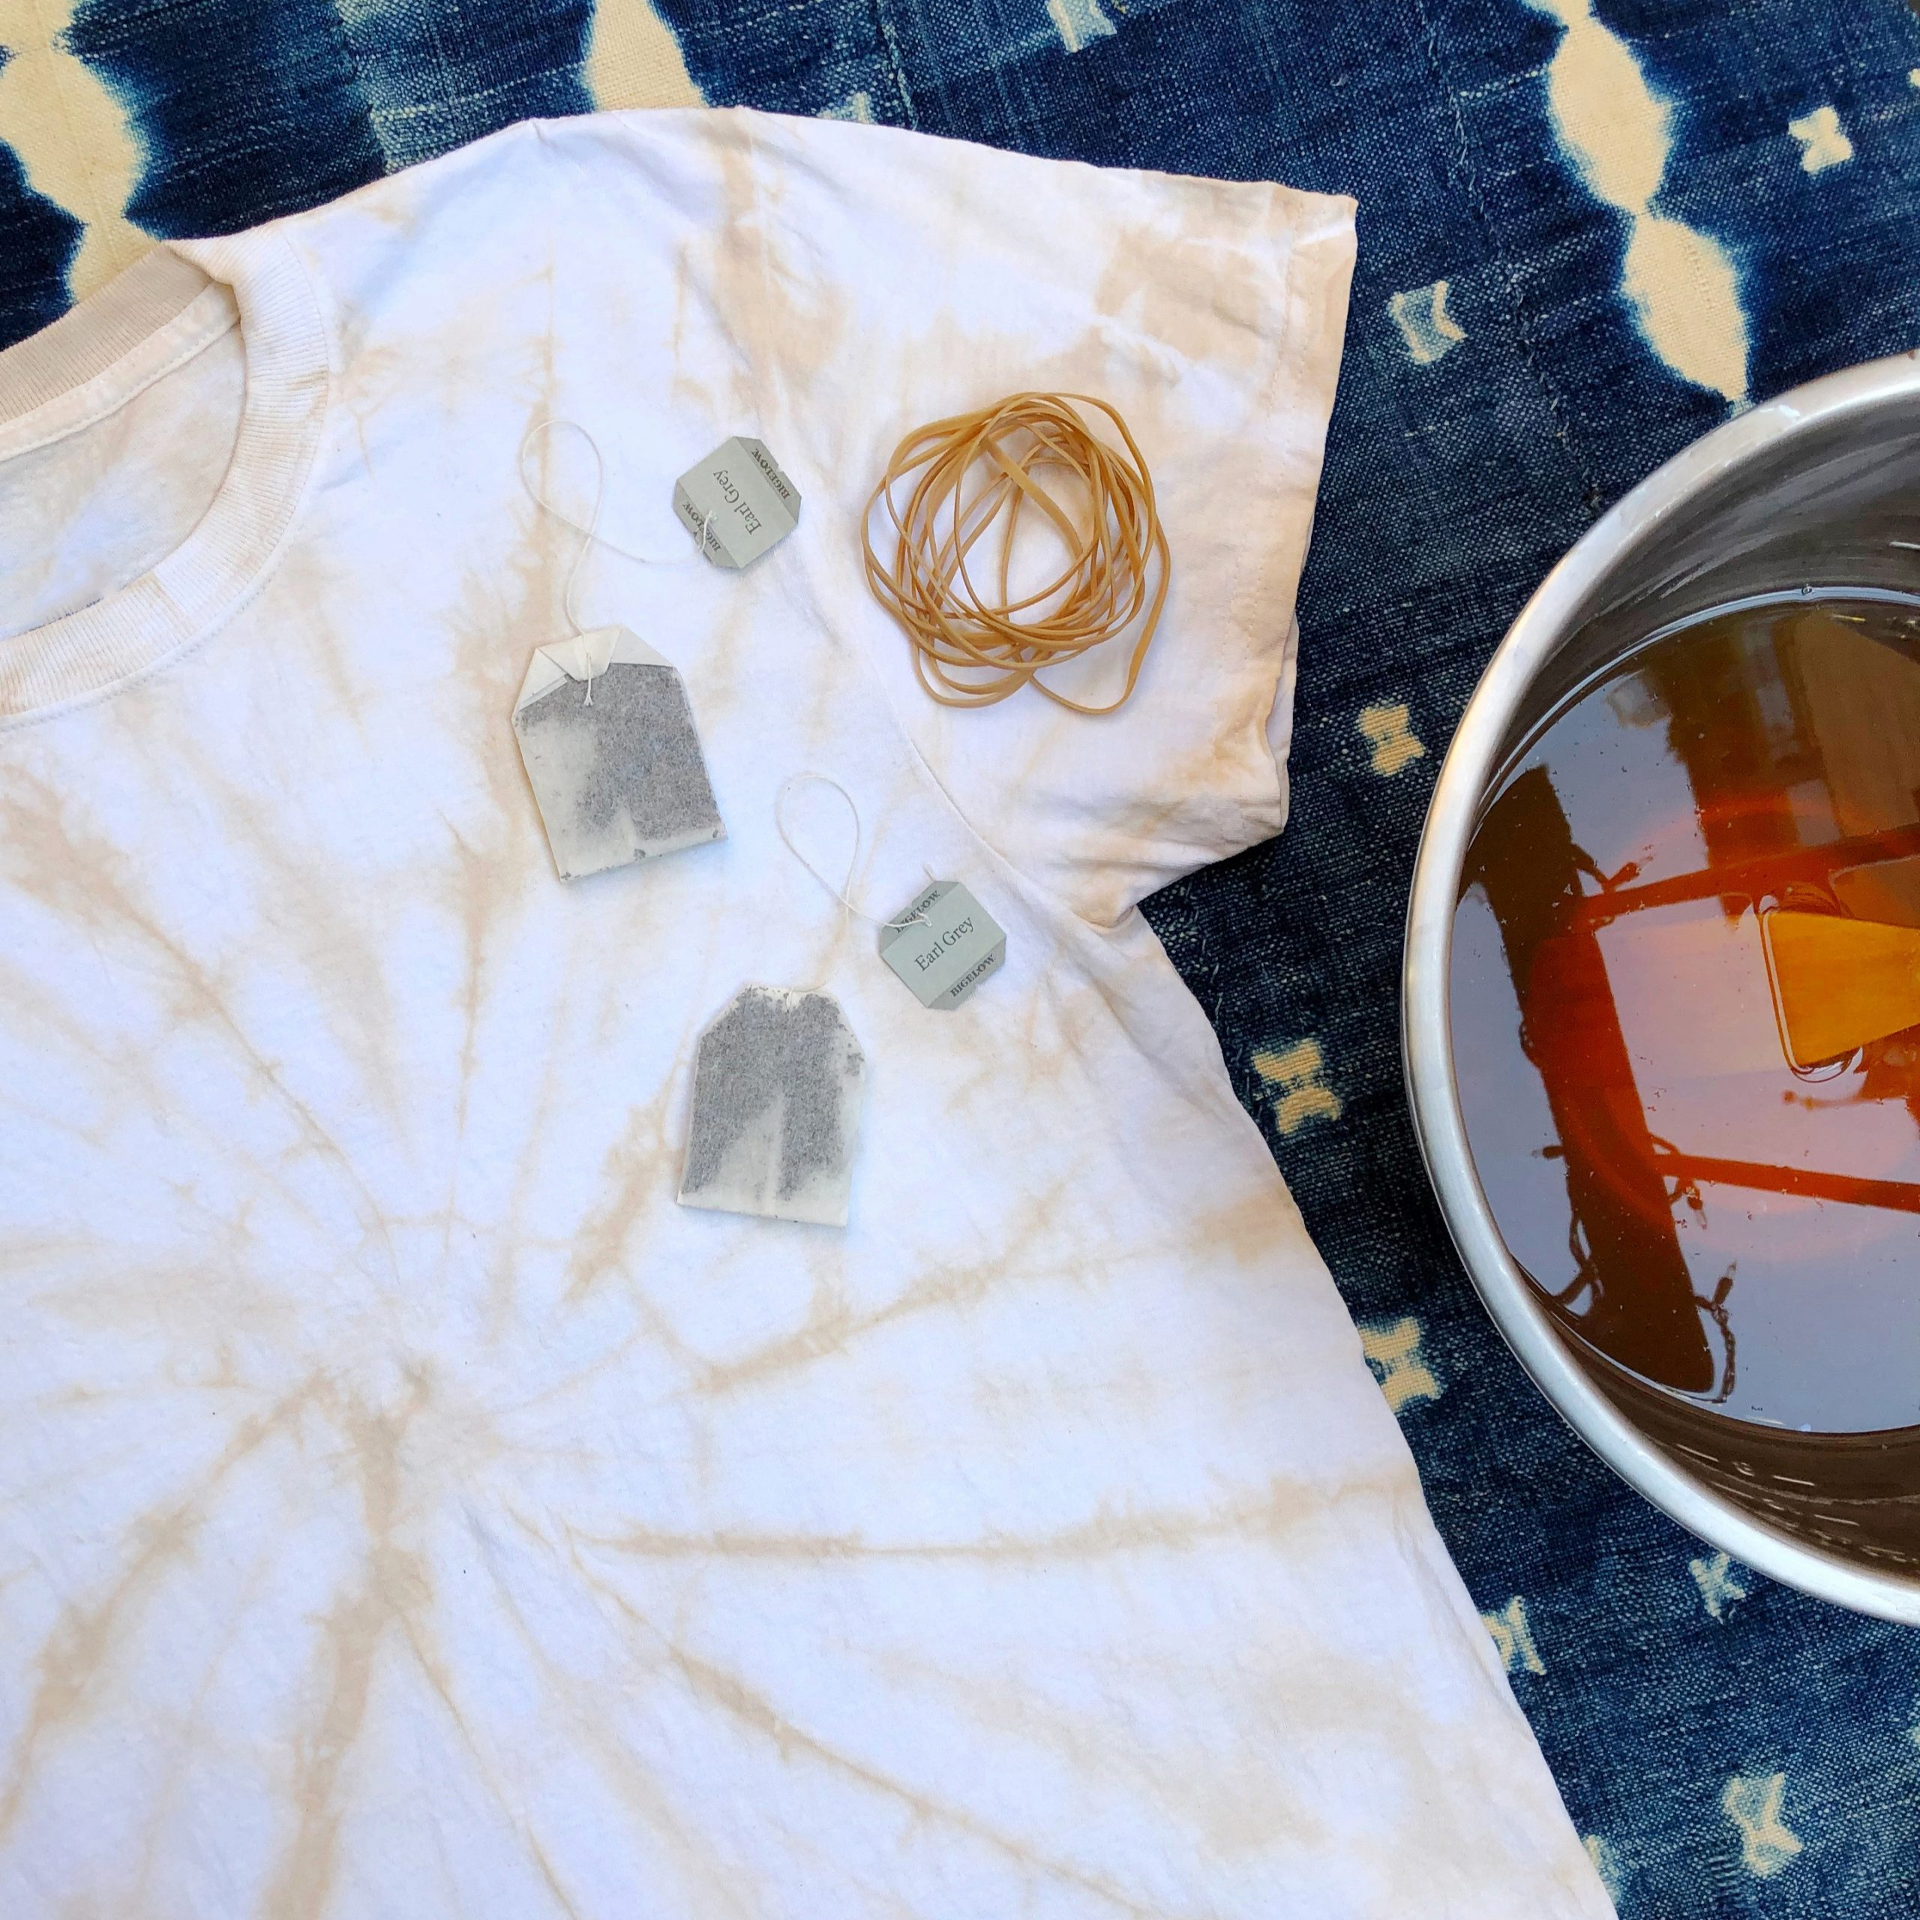 The Neon Tea Party - At Home - Tea Tie Dye 1 copy